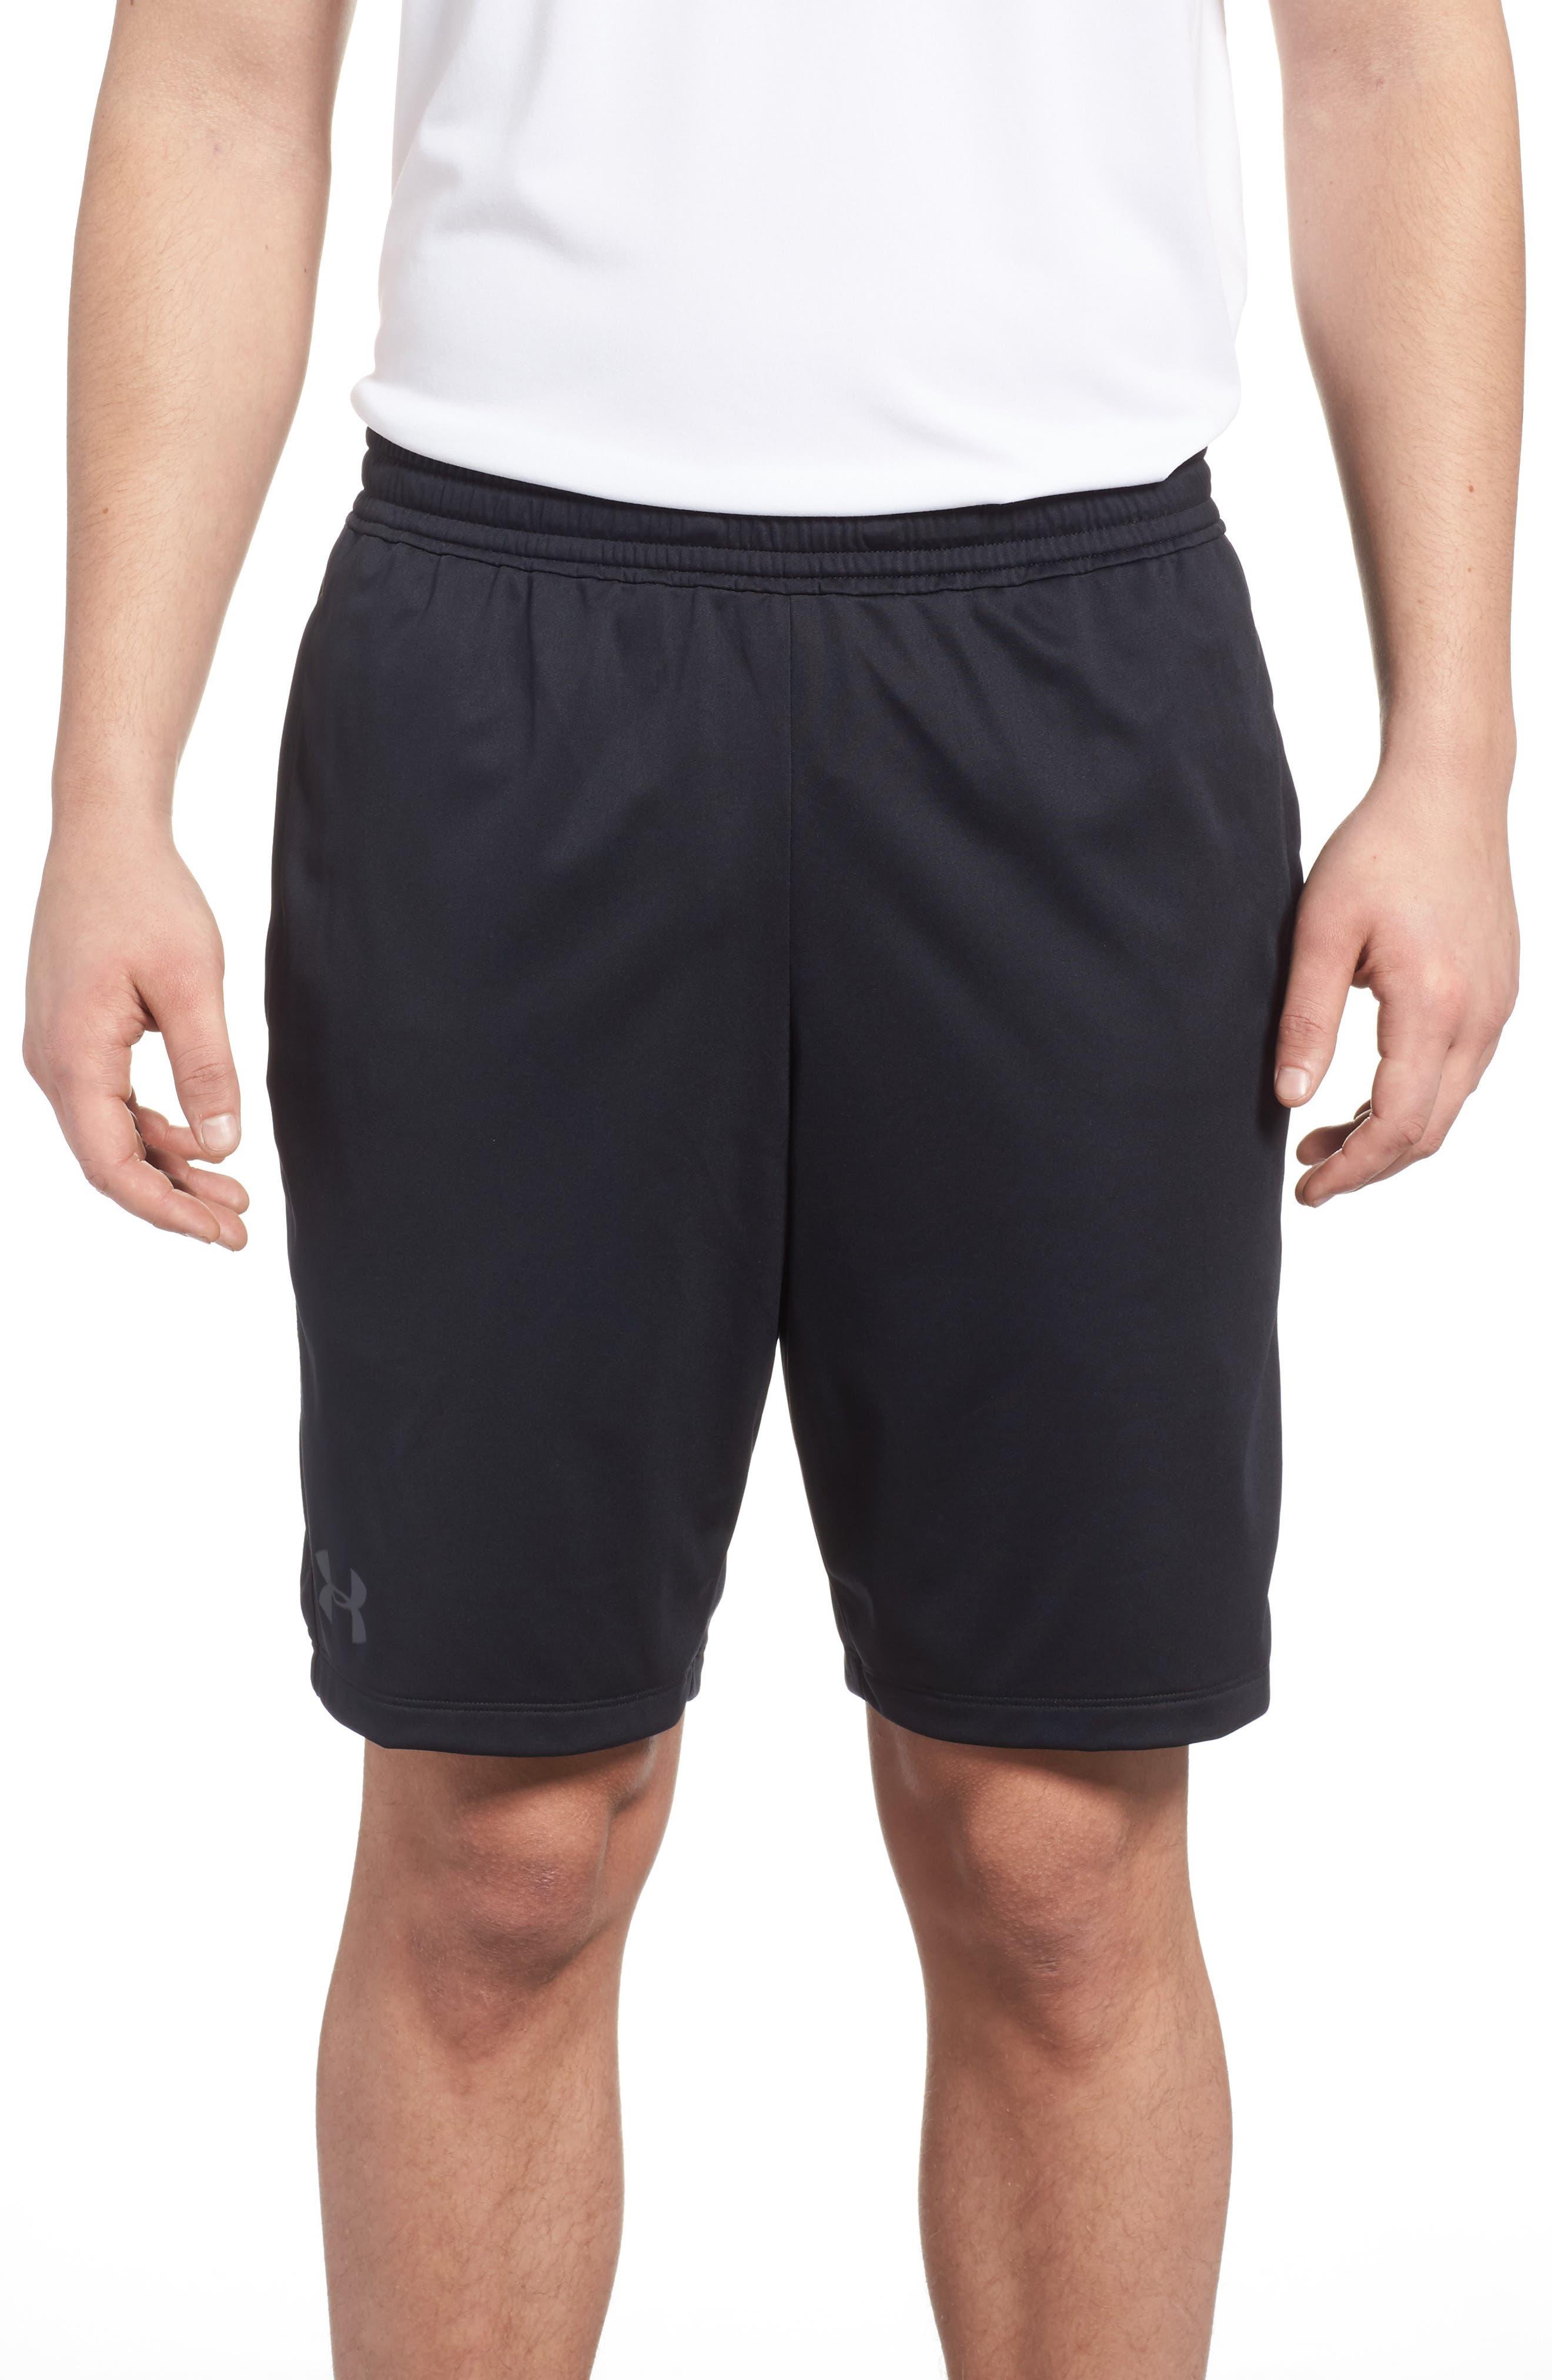 Raid 2.0 Classic Fit Shorts,                             Main thumbnail 1, color,                             BLACK